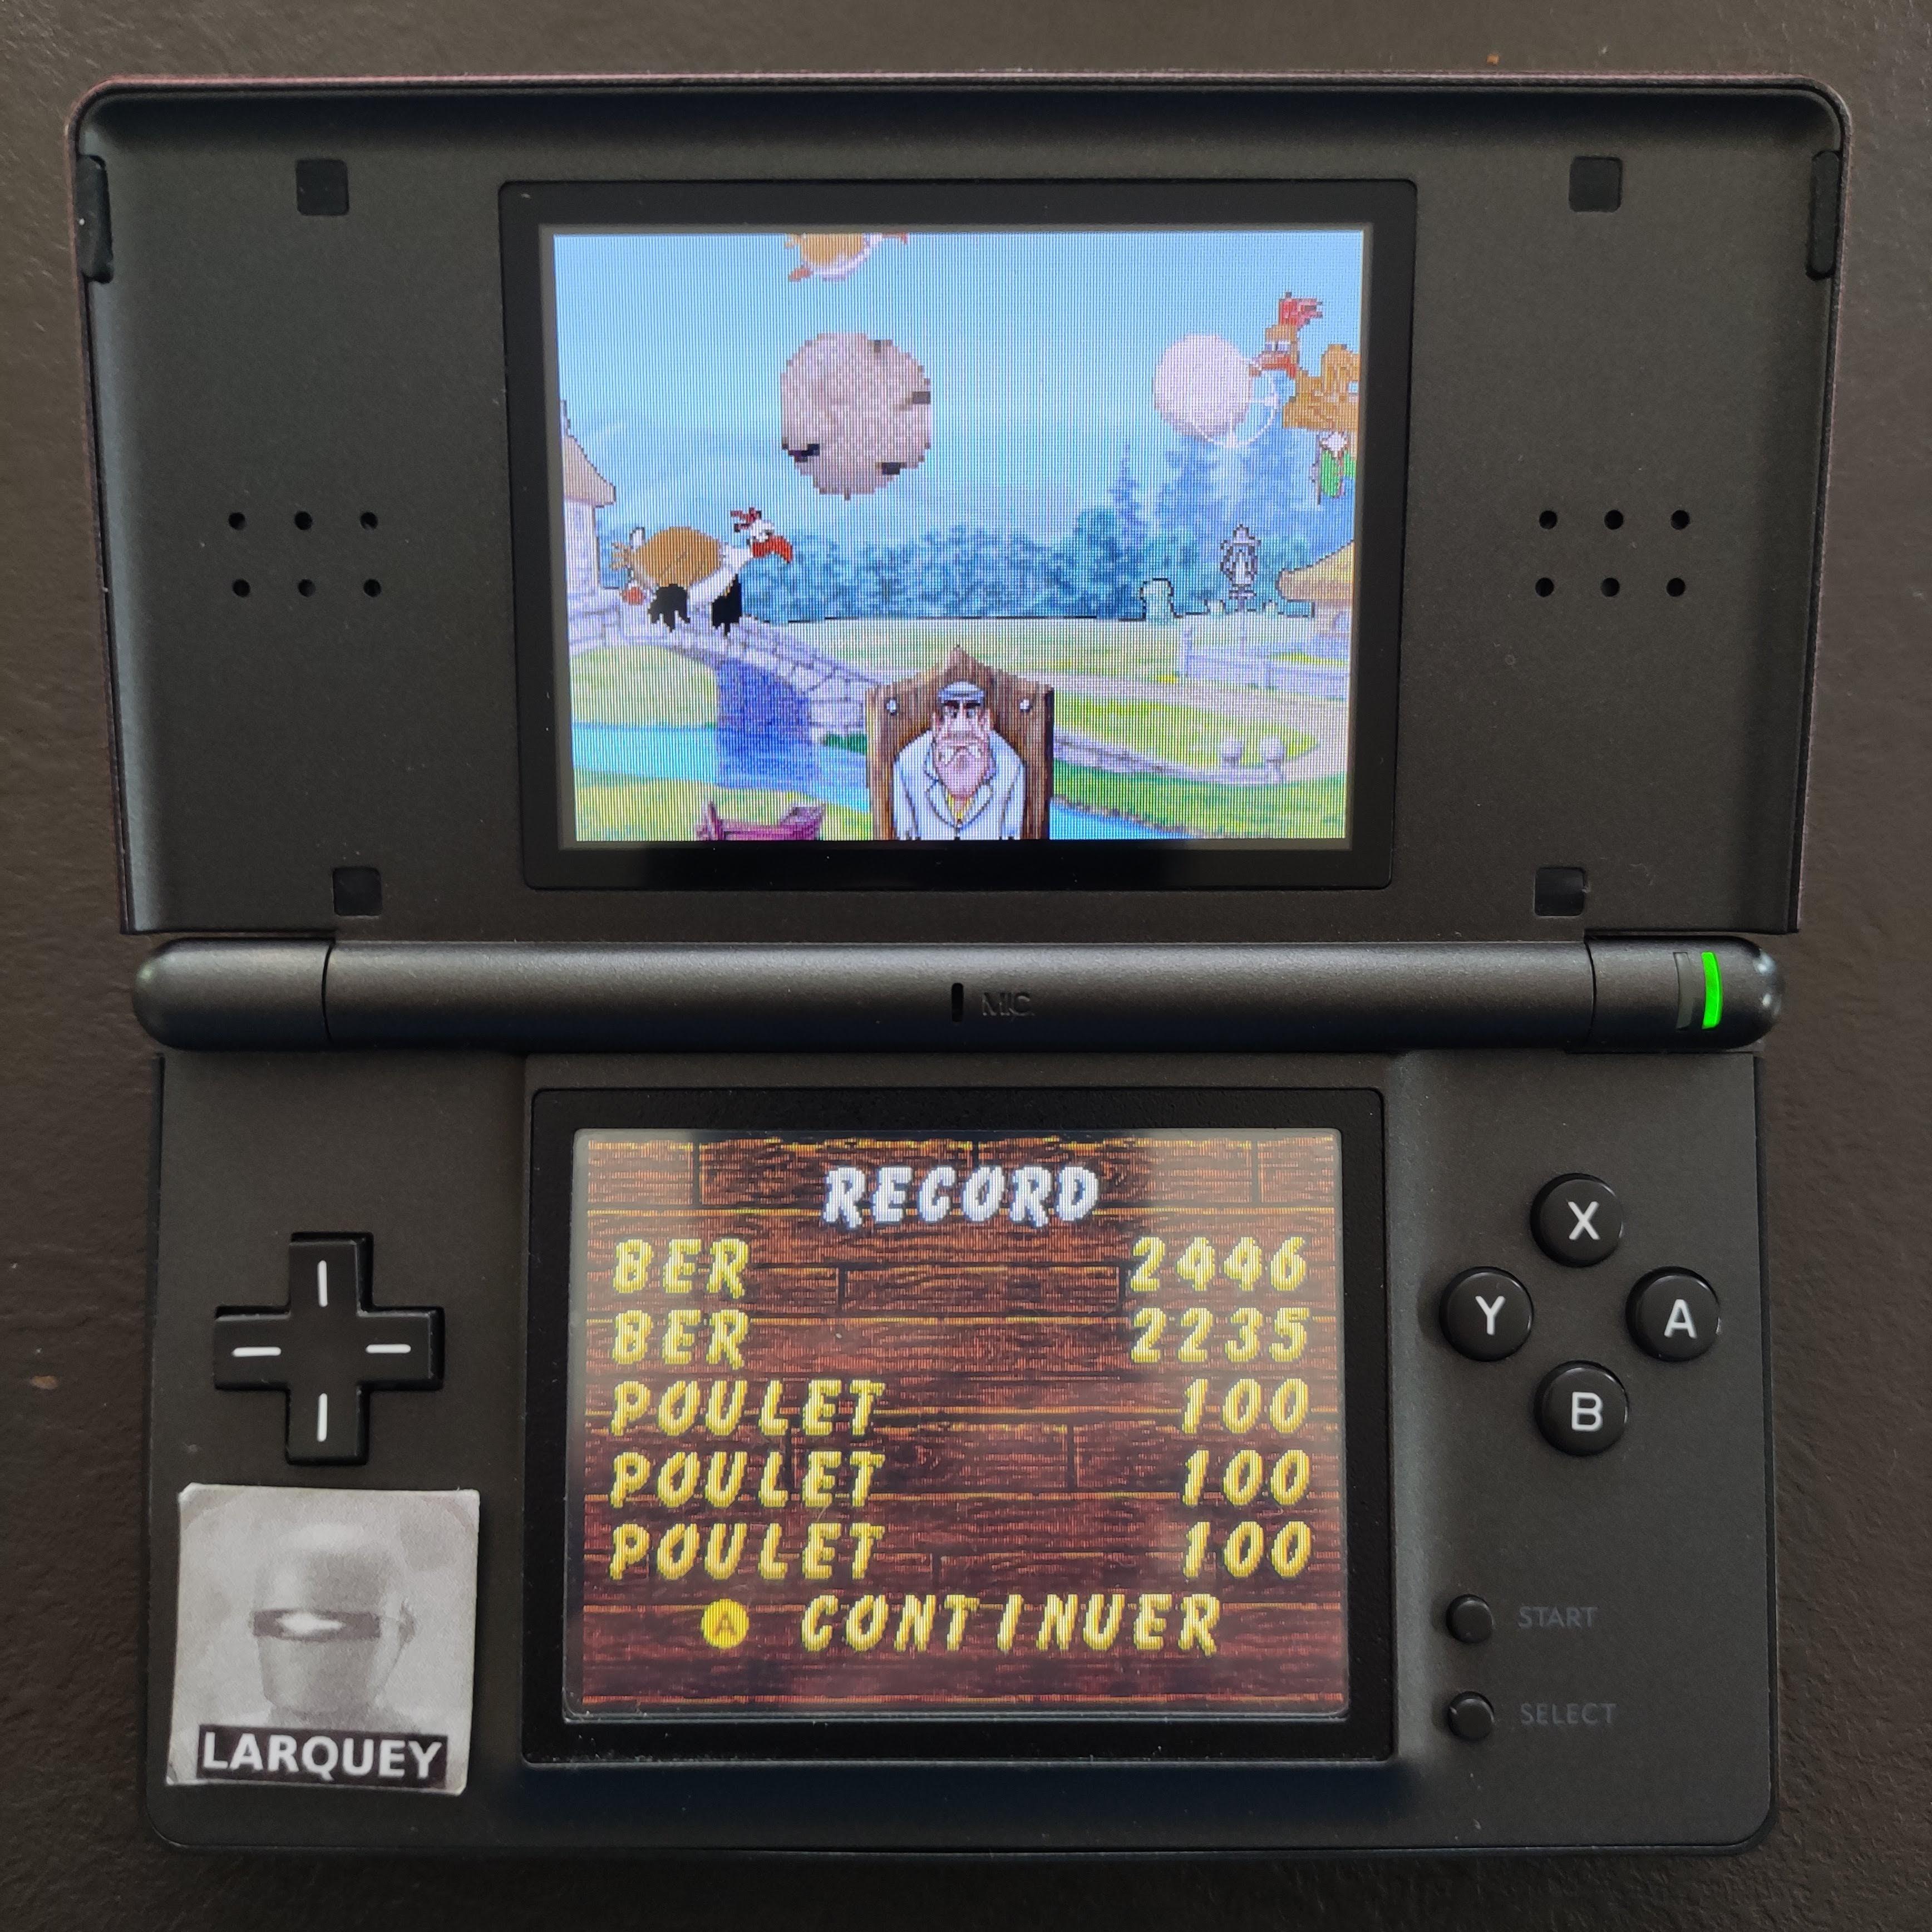 Larquey: Chicken Shoot [Arcade: Normal] (Nintendo DS) 2,446 points on 2020-09-27 03:27:32